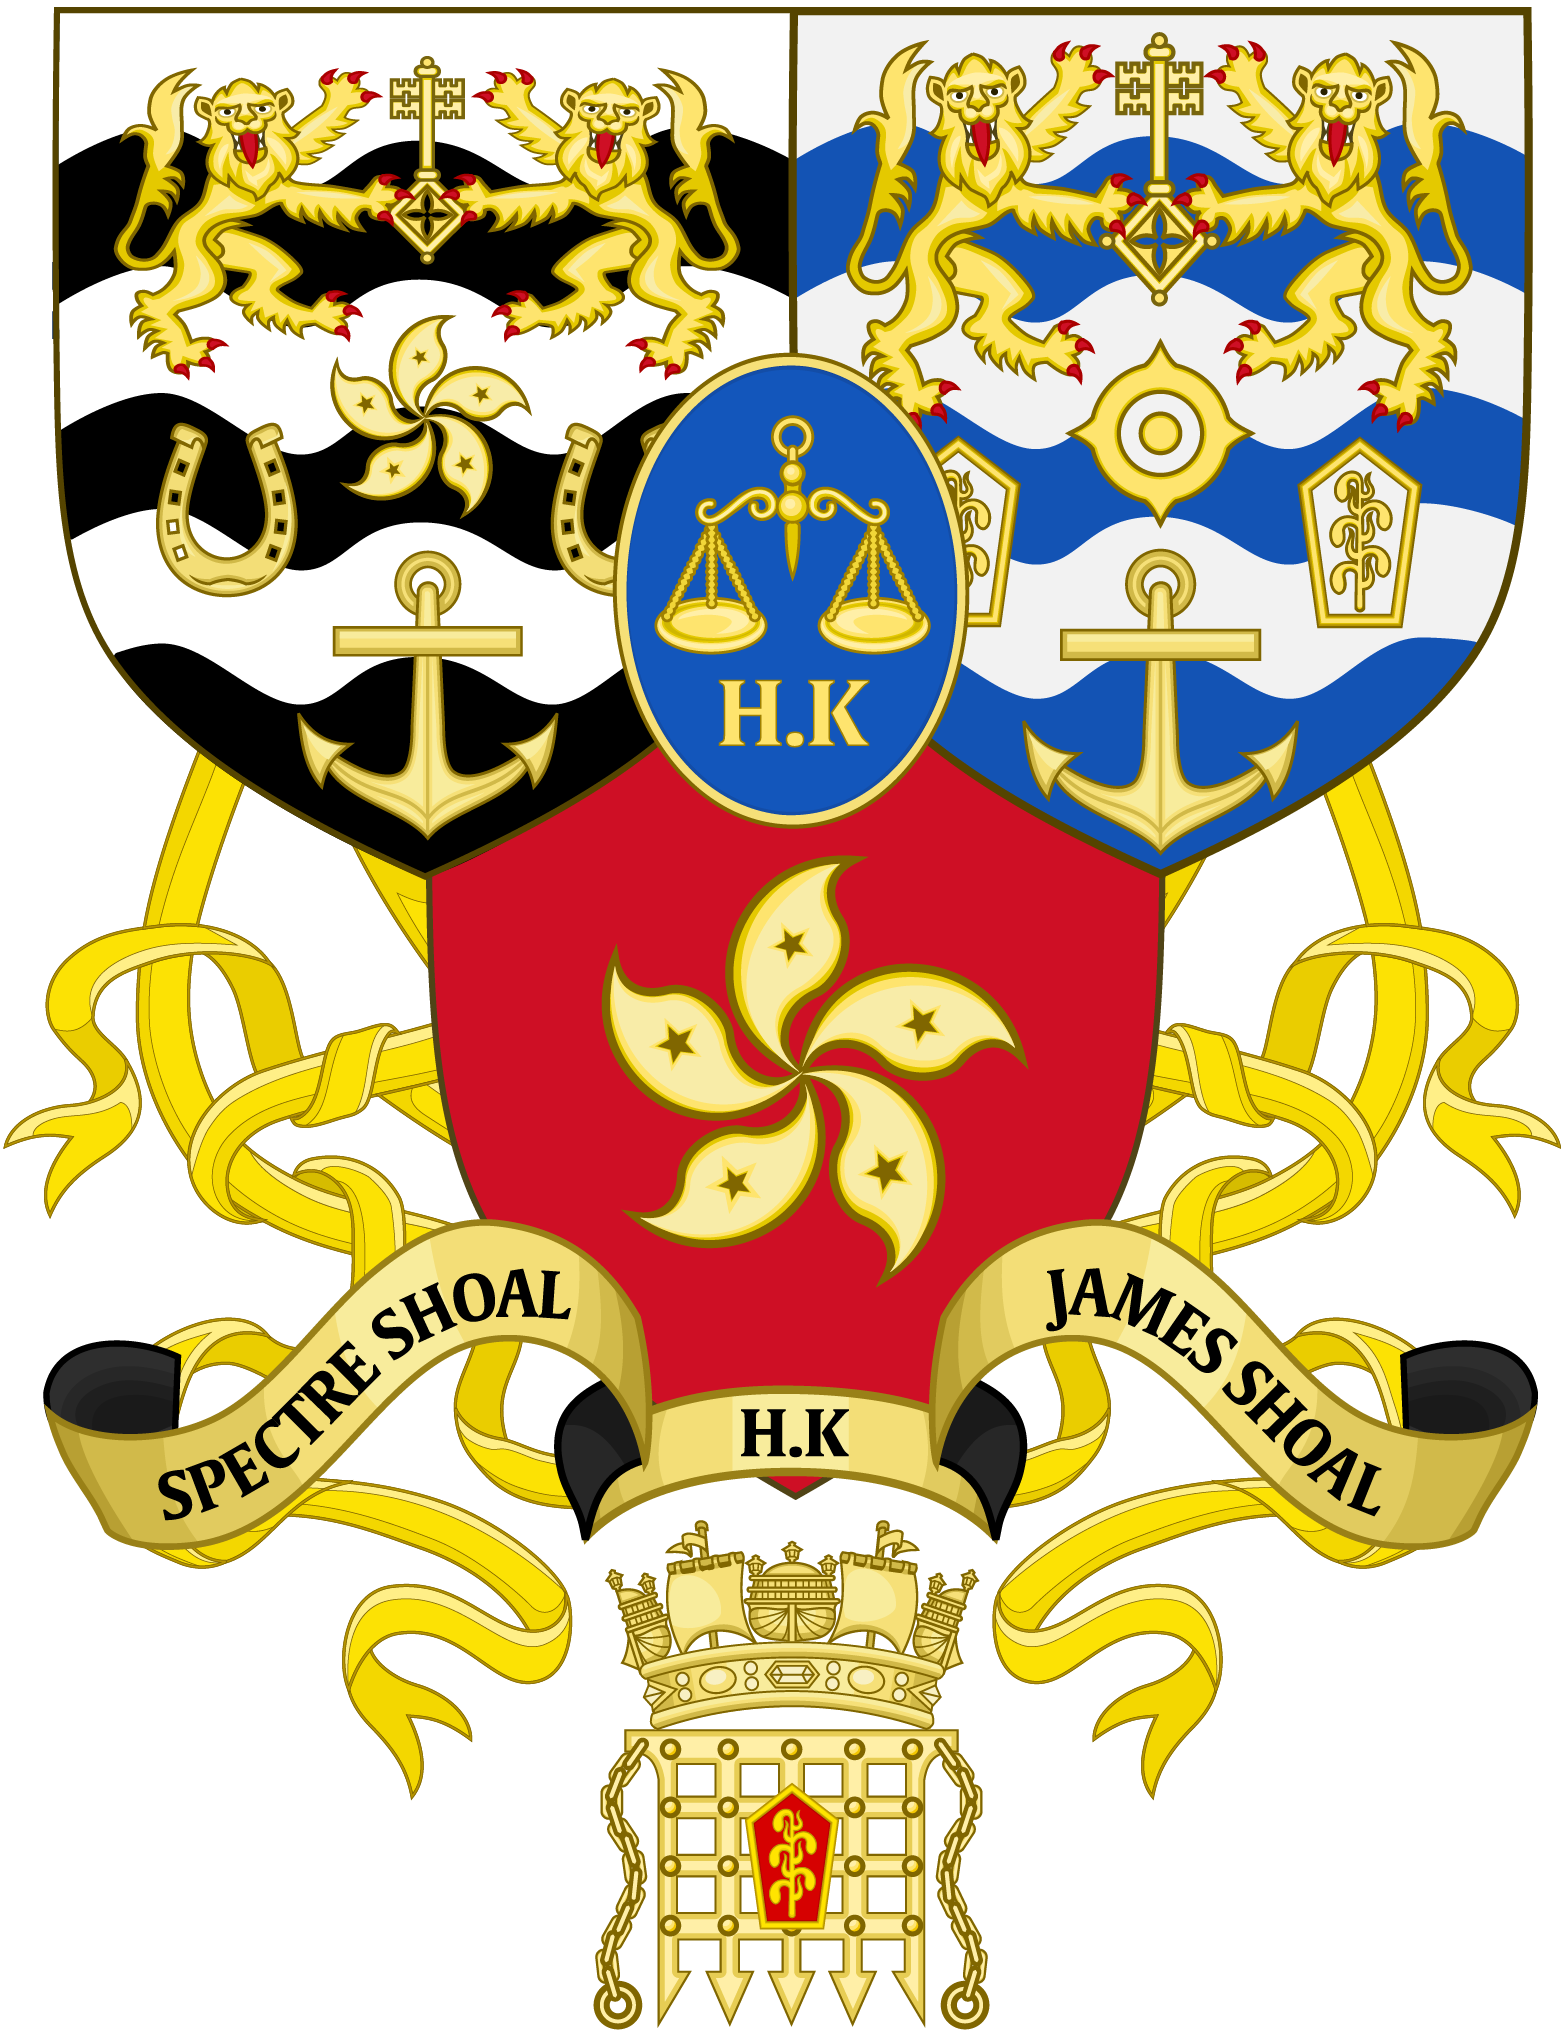 Commonwealth of H.K.